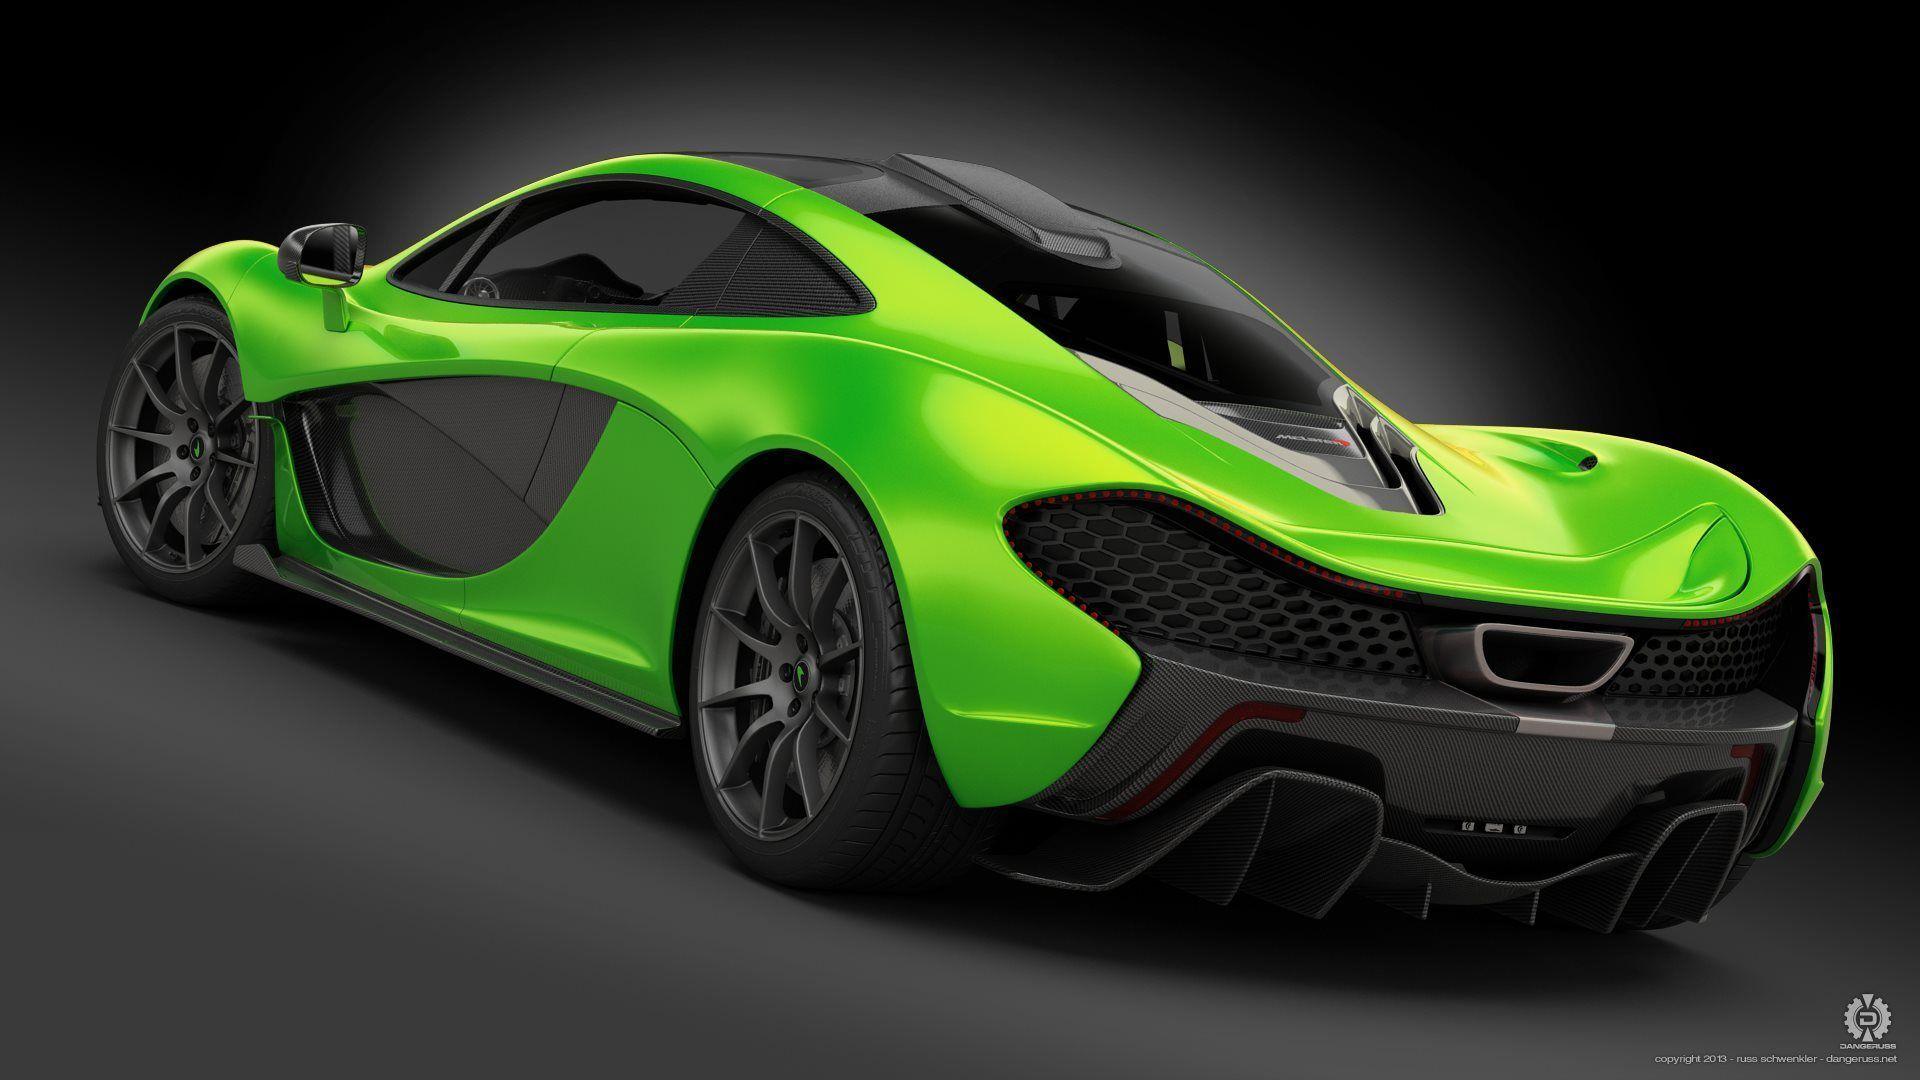 Satin Cerulean Blue P Photoshoot McLaren Life | HD Wallpapers | Pinterest | Mclaren  P1, Wallpaper And Cars